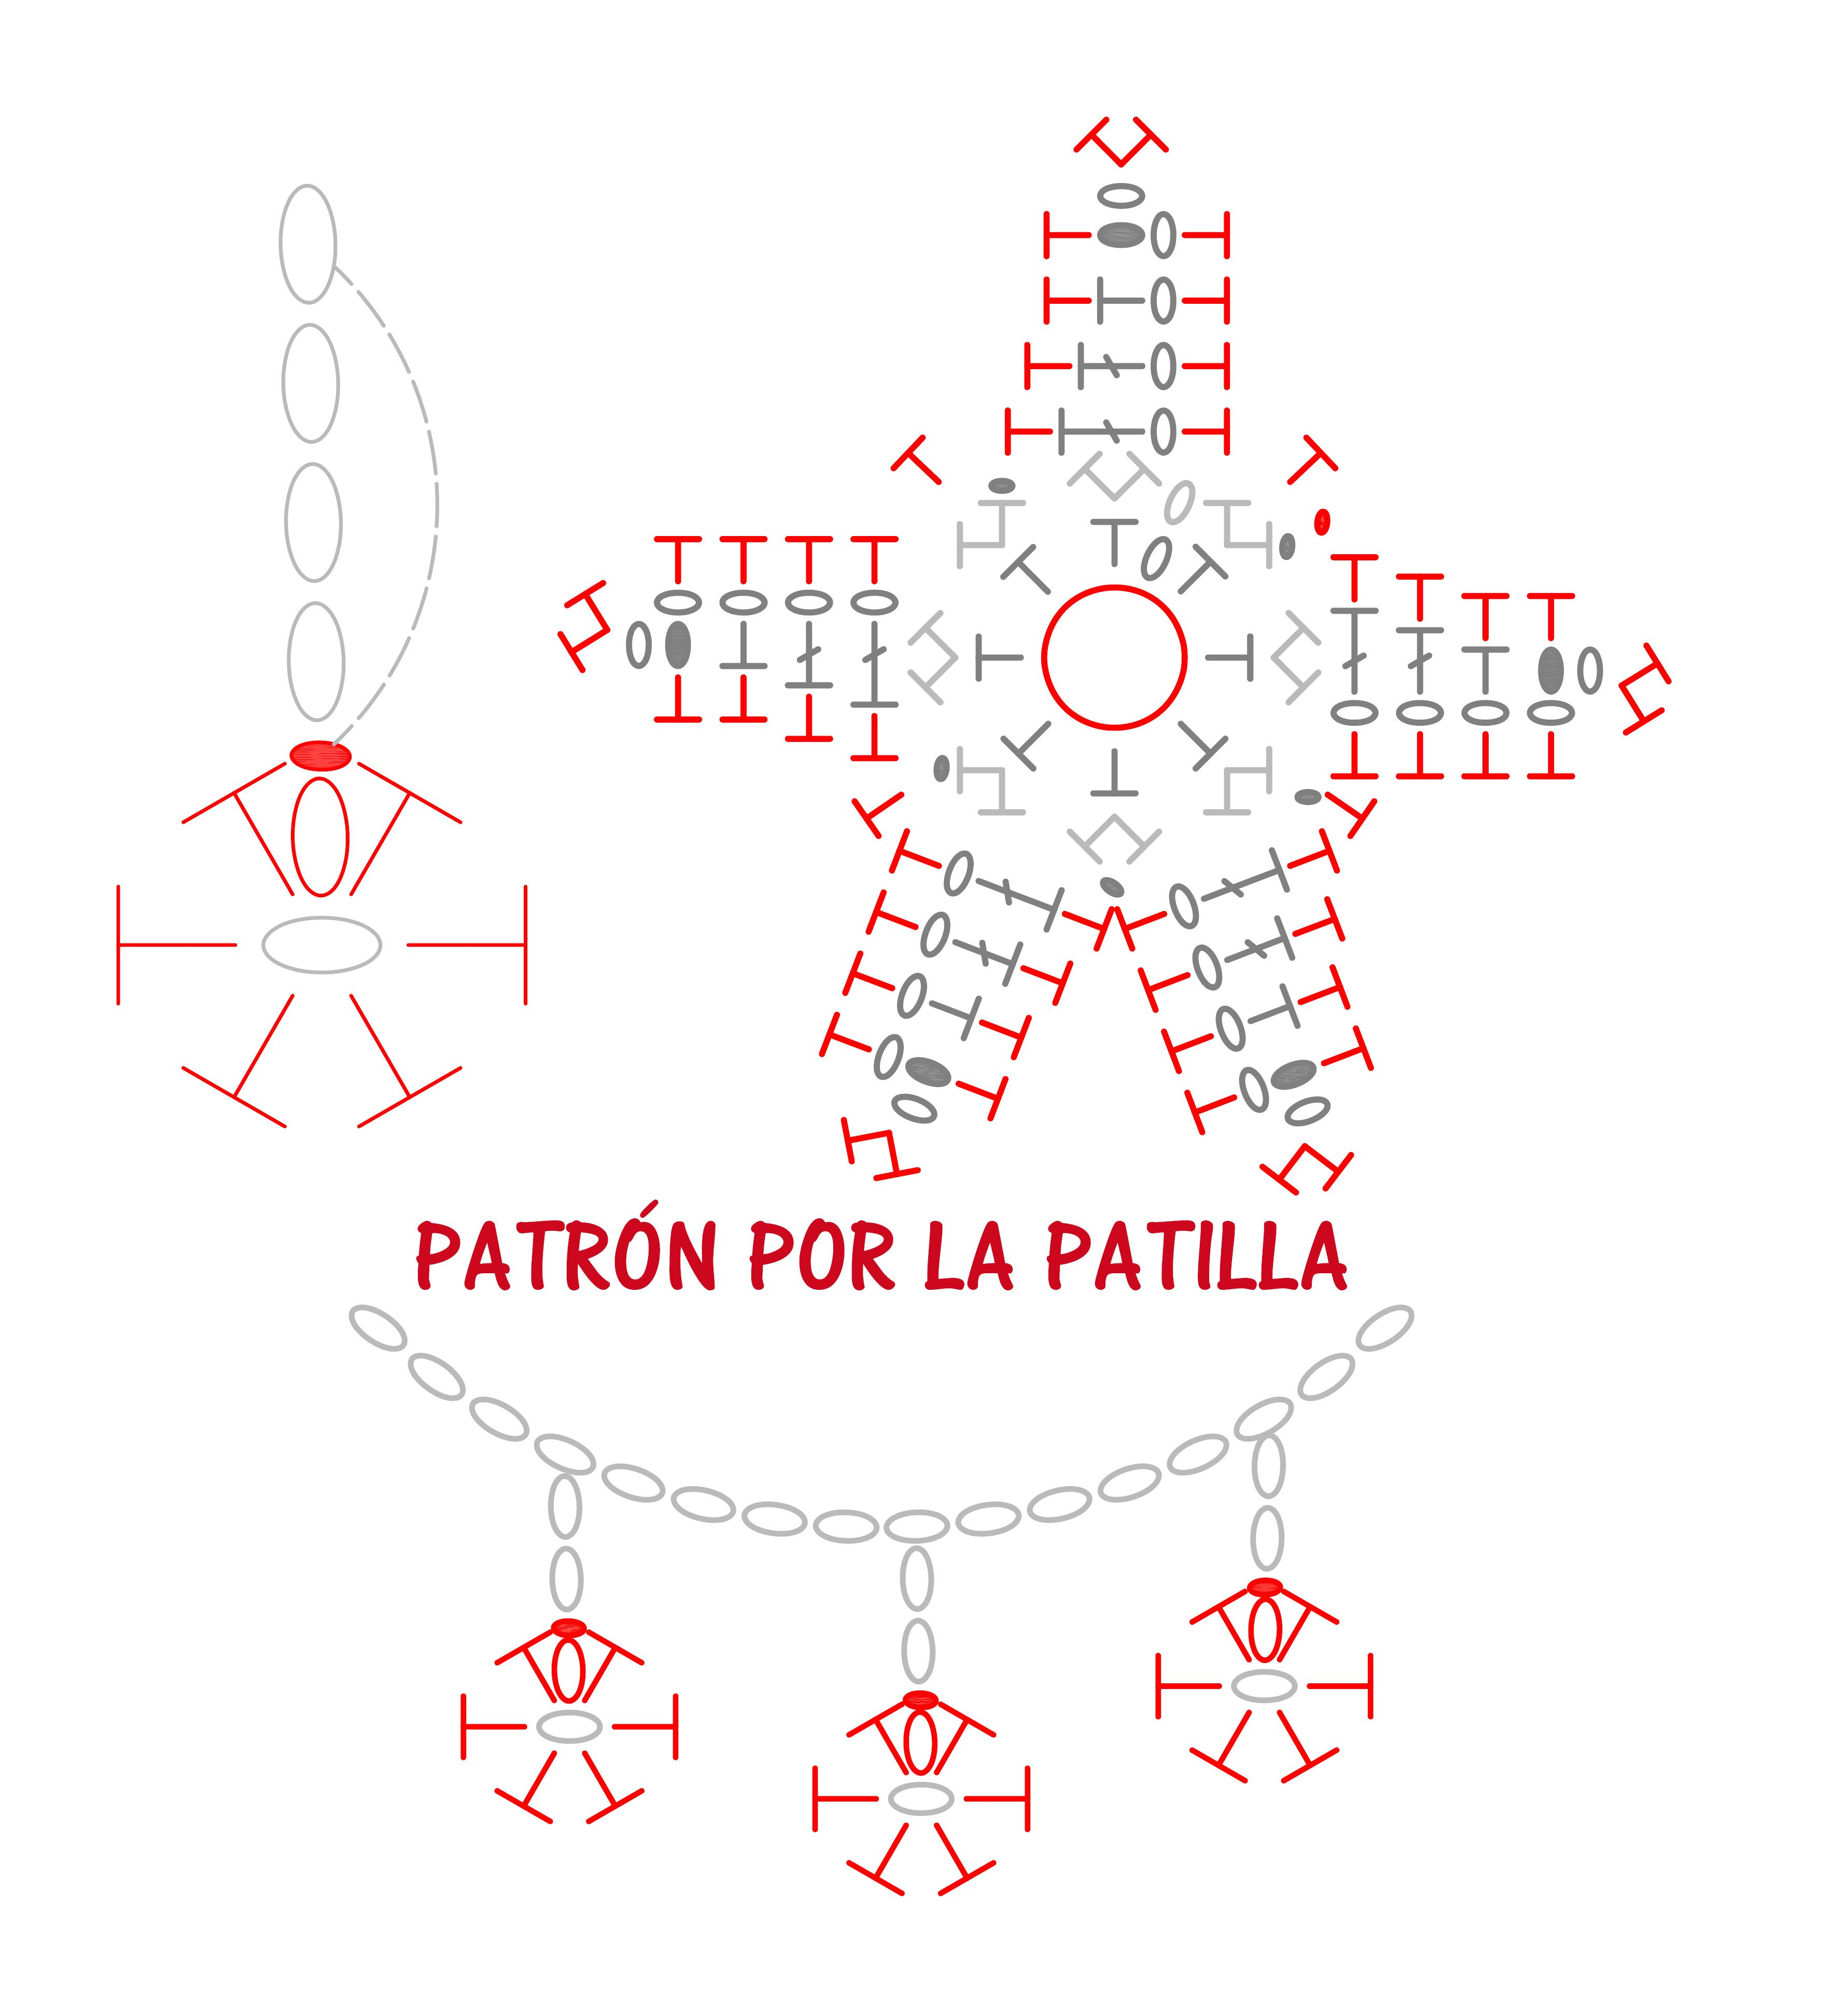 DIY-patron estrella bolas crochet http://idoproyect.com/blog/home ...